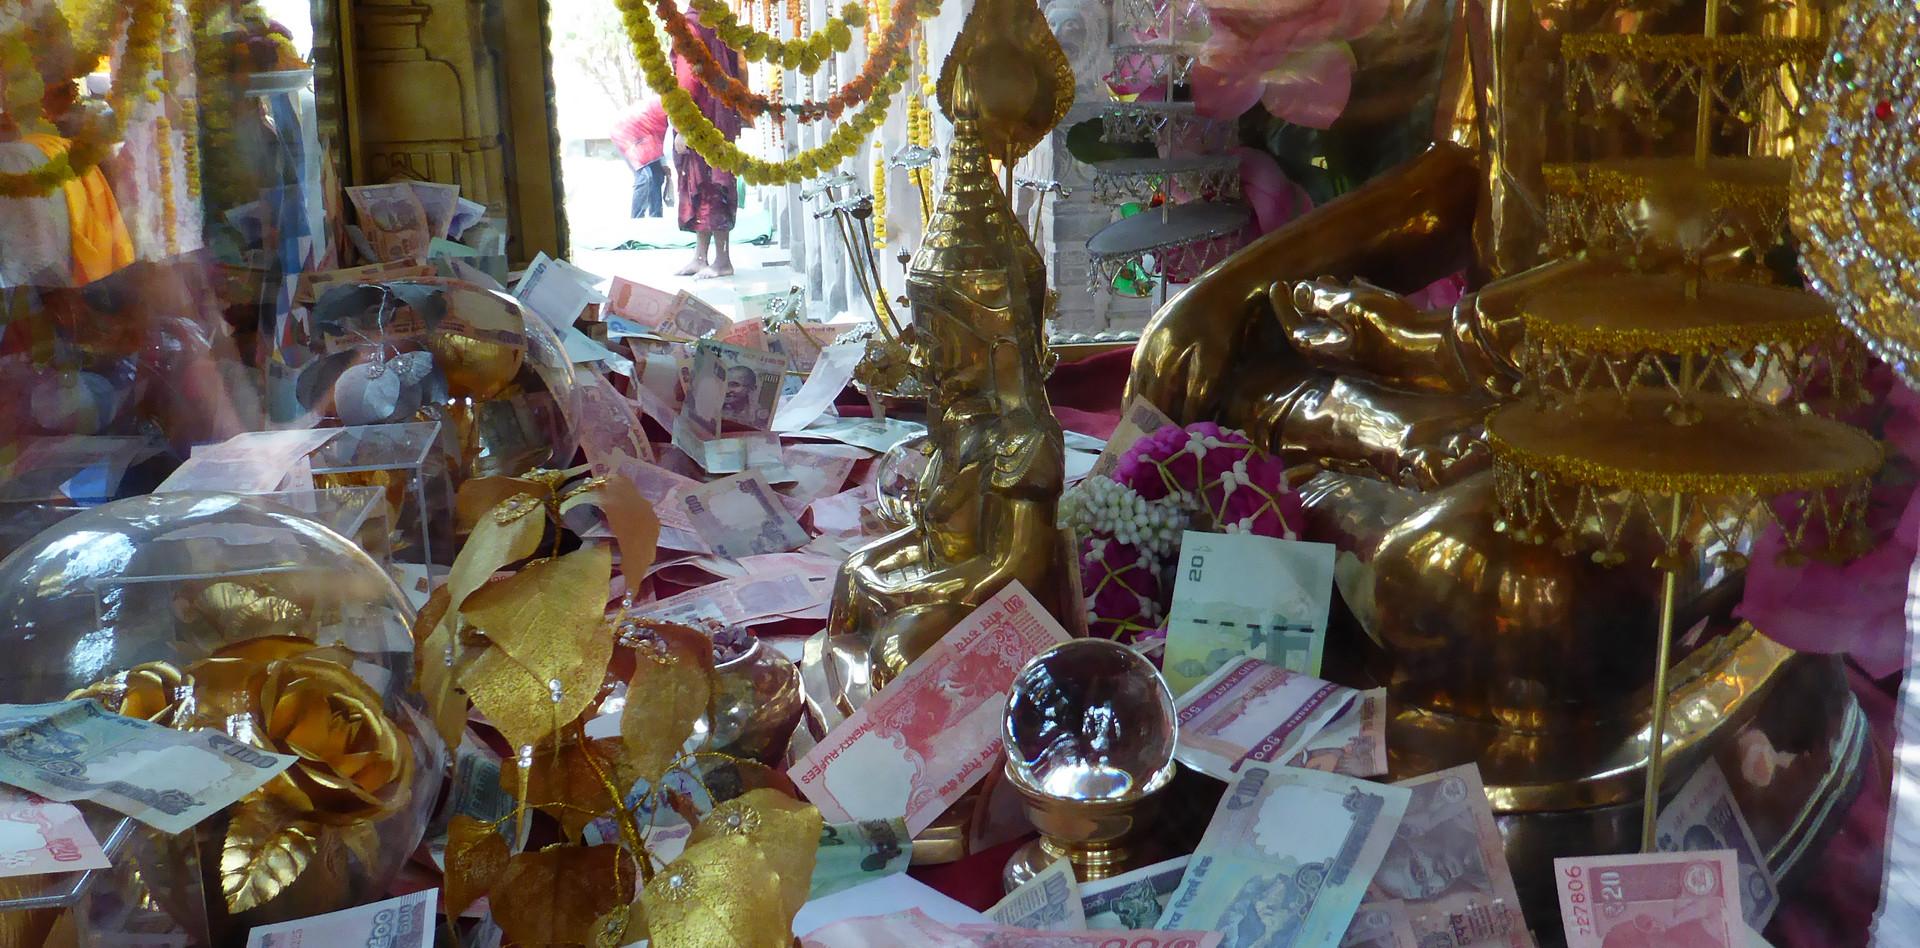 Donations to Buddha